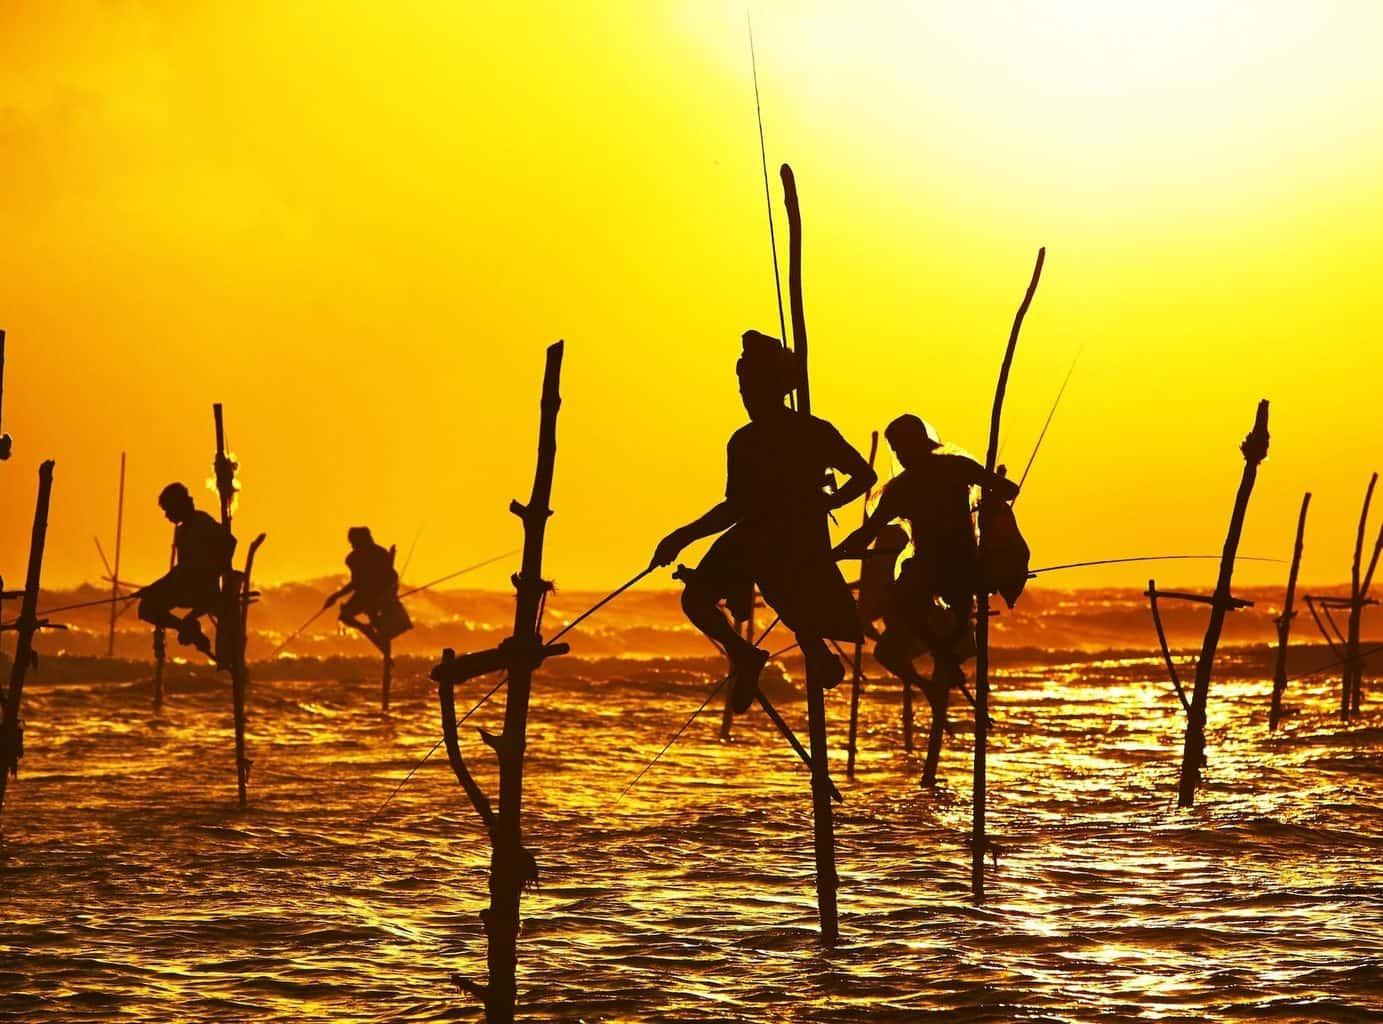 Luxury Sri Lanka Holidays silhoettes in water at sunset